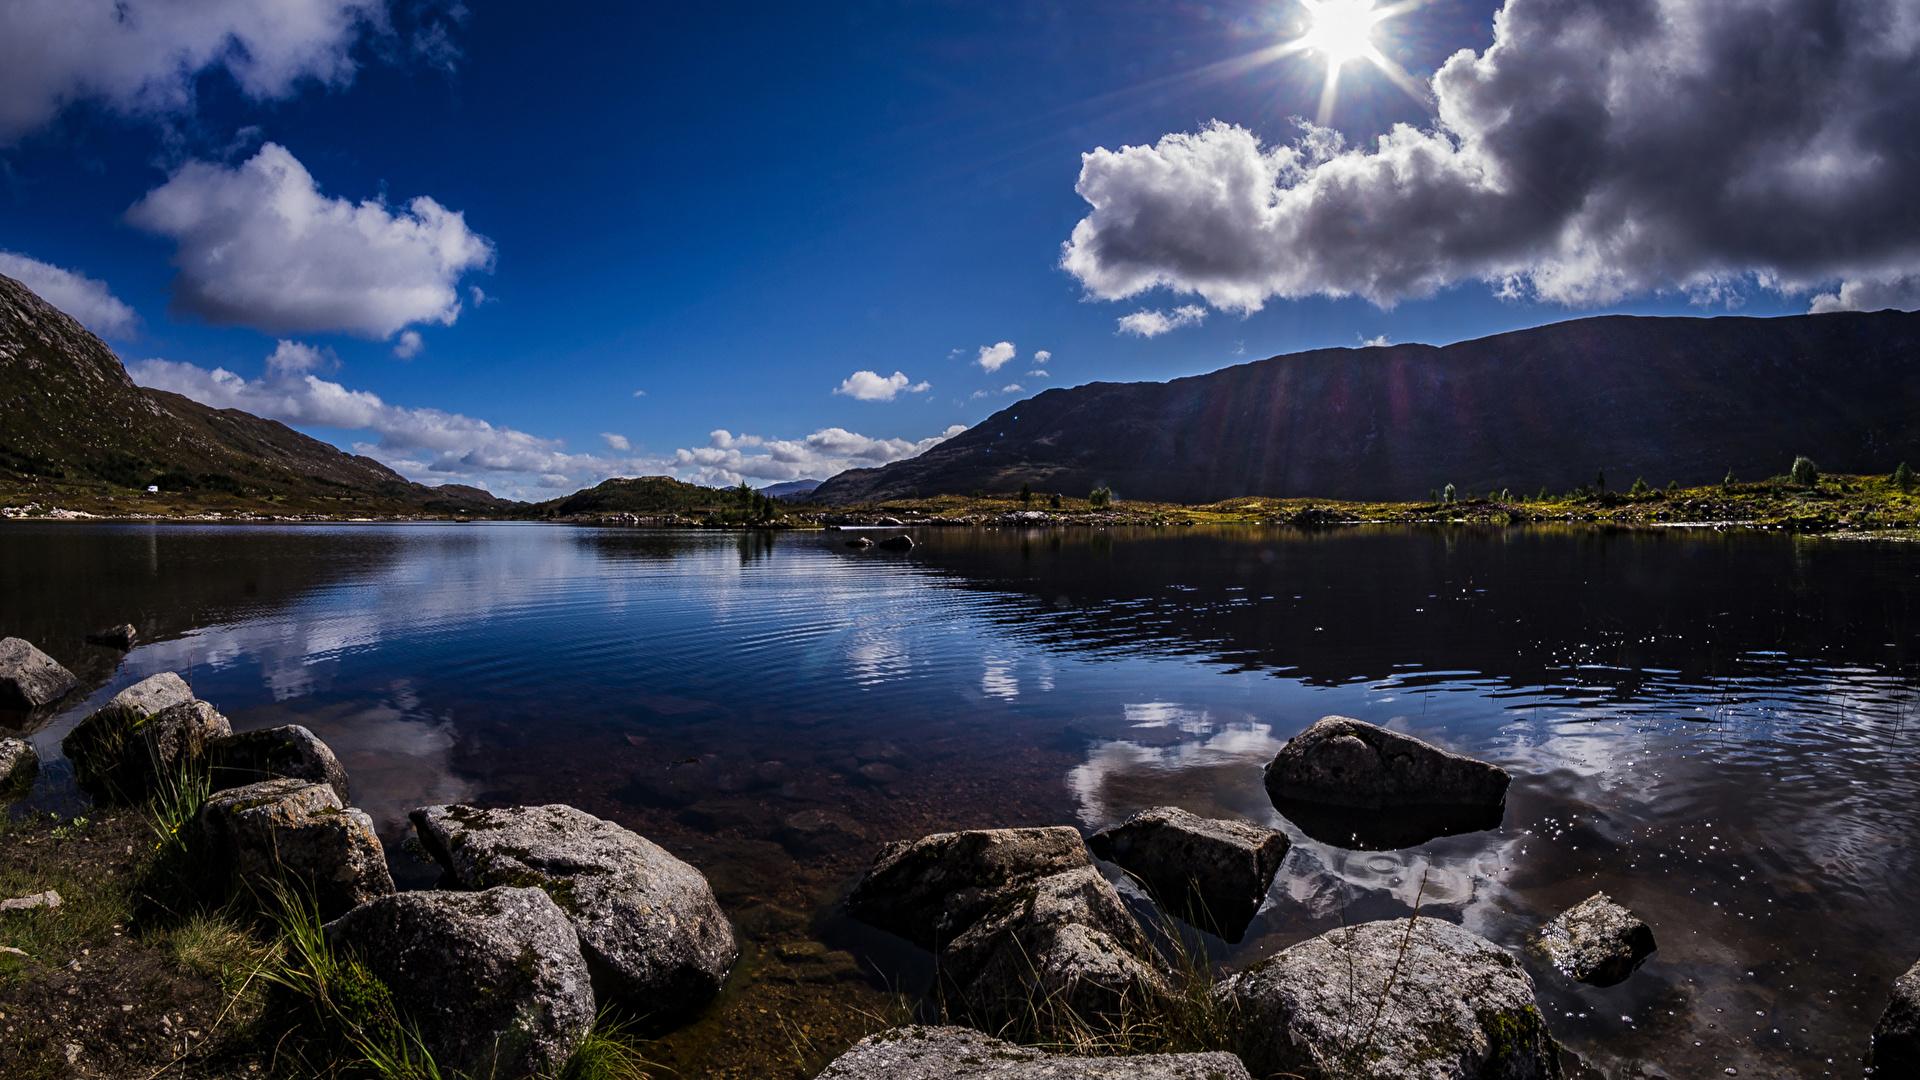 Картинка Шотландия Achallader Горы солнца Природа Озеро Камень Облака 1920x1080 Солнце Камни облако облачно